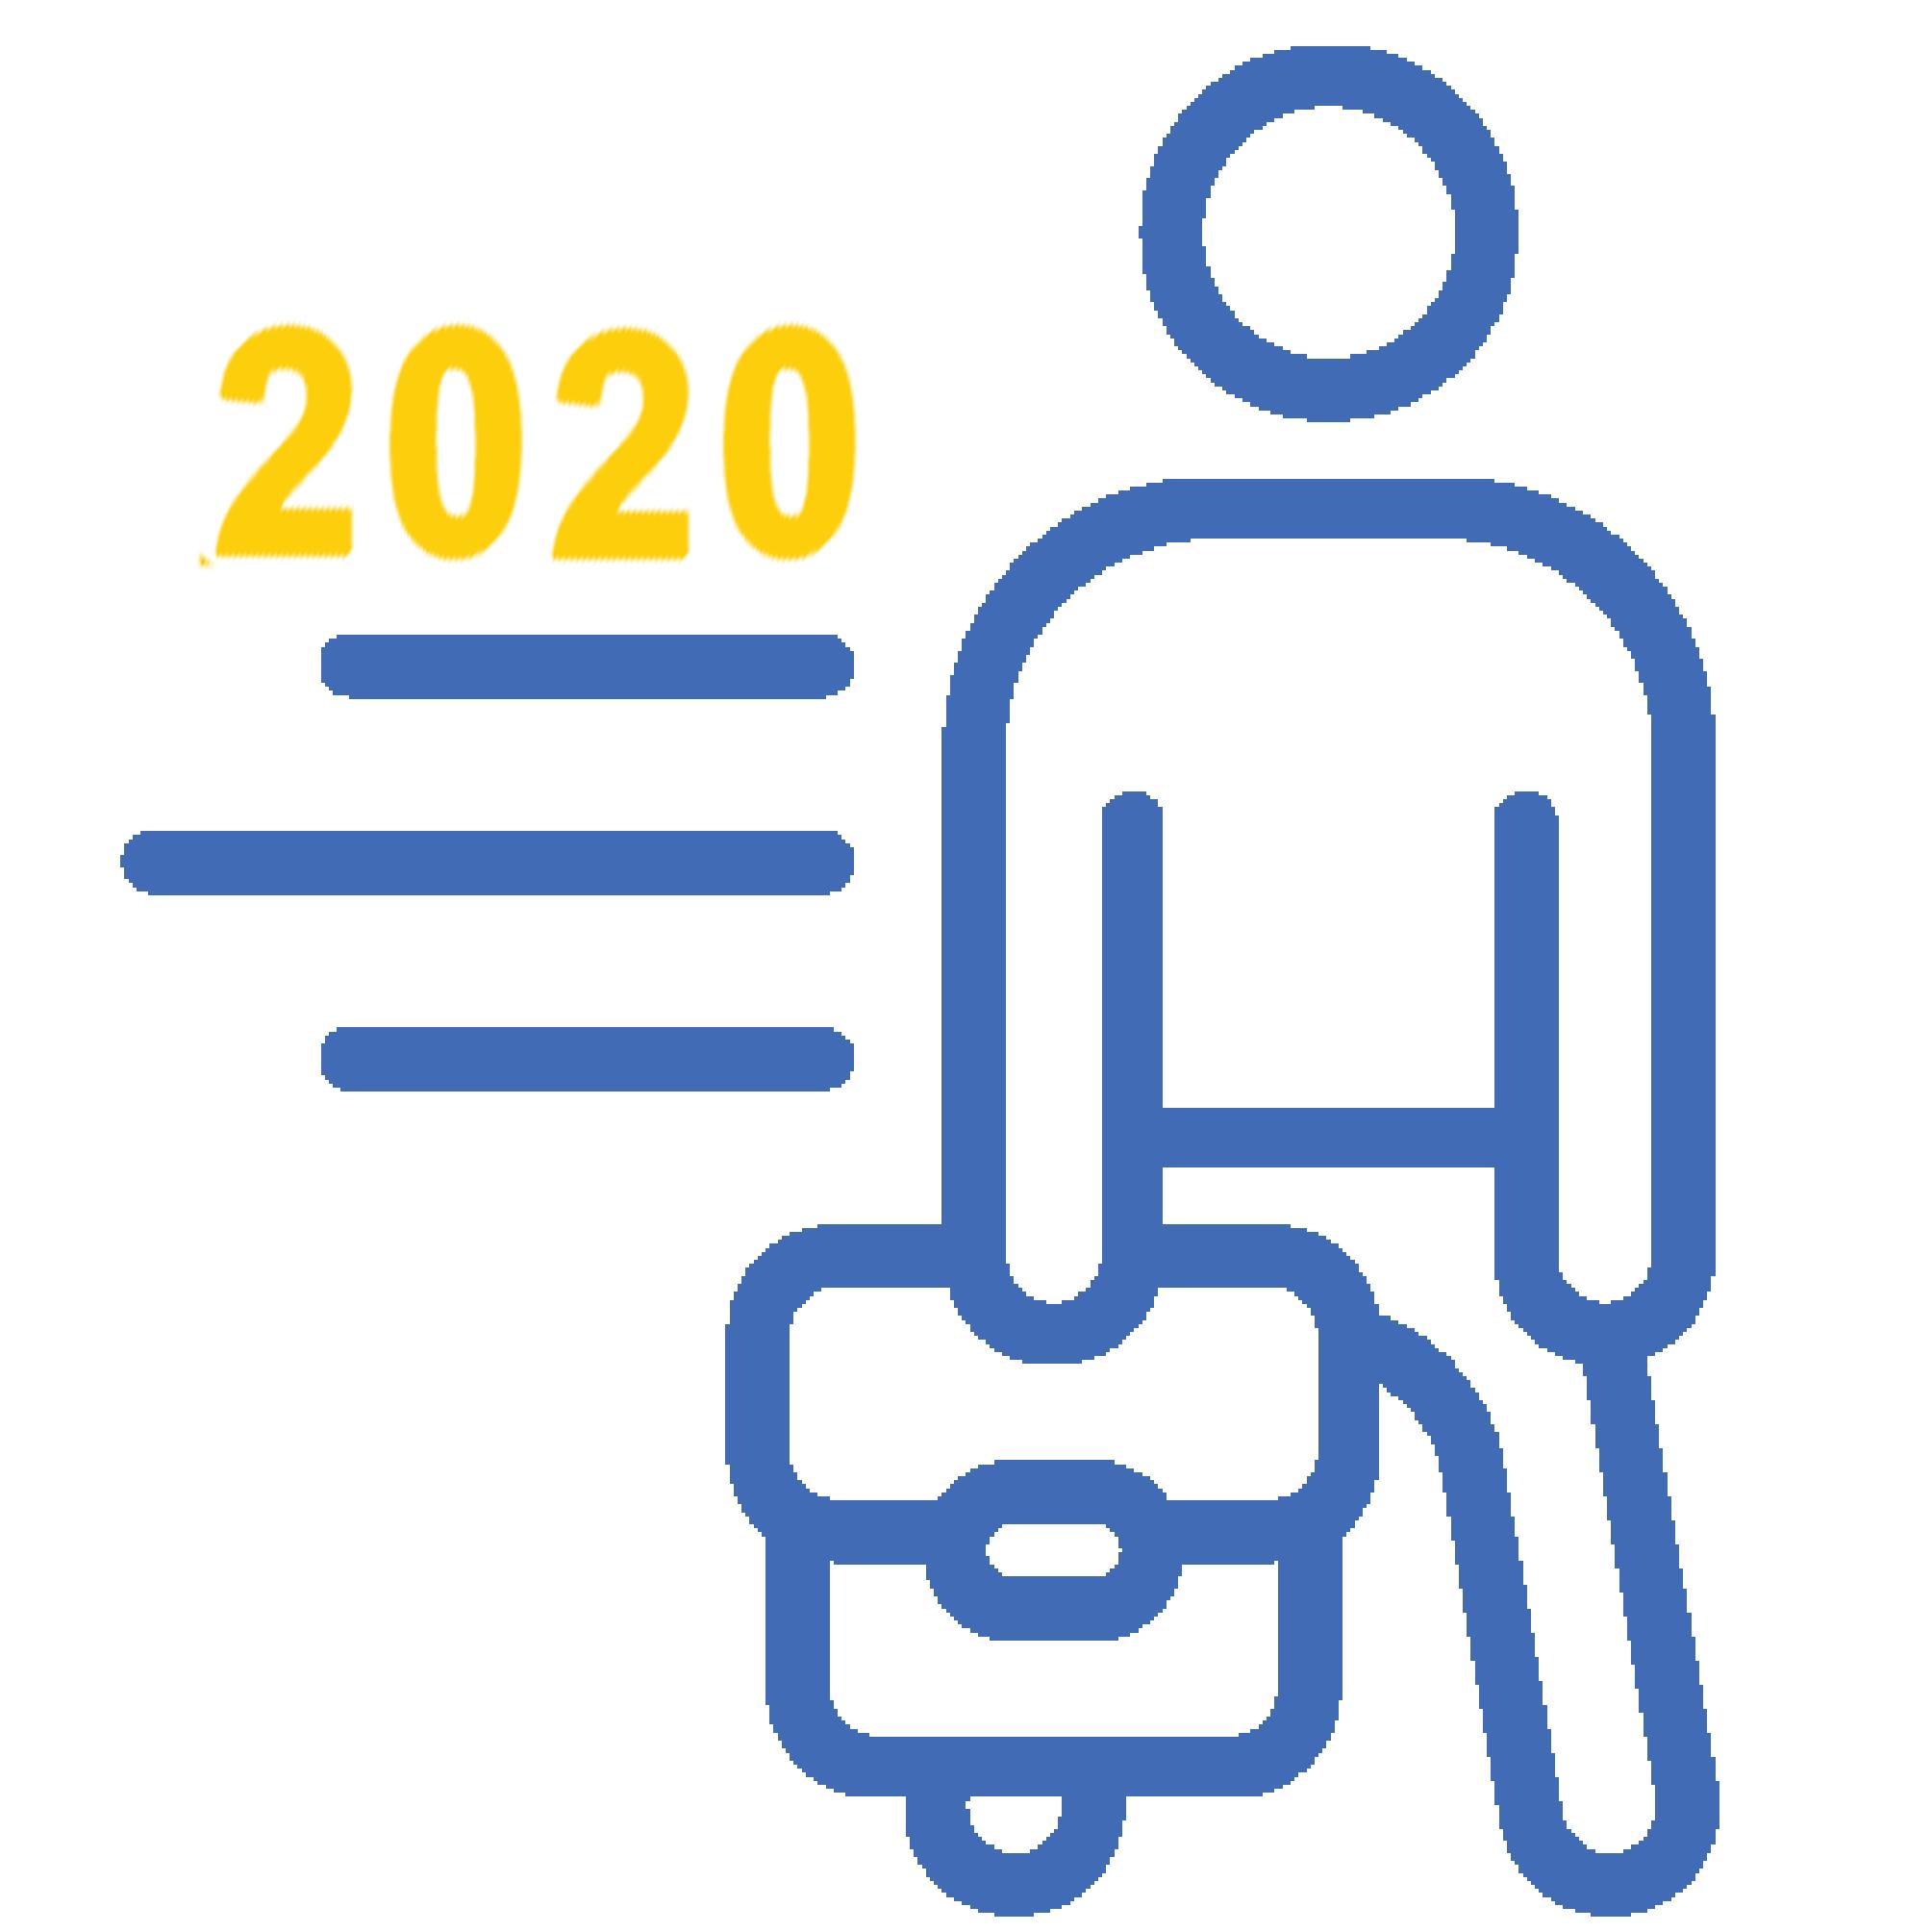 Plano Anual de Atividades 2020